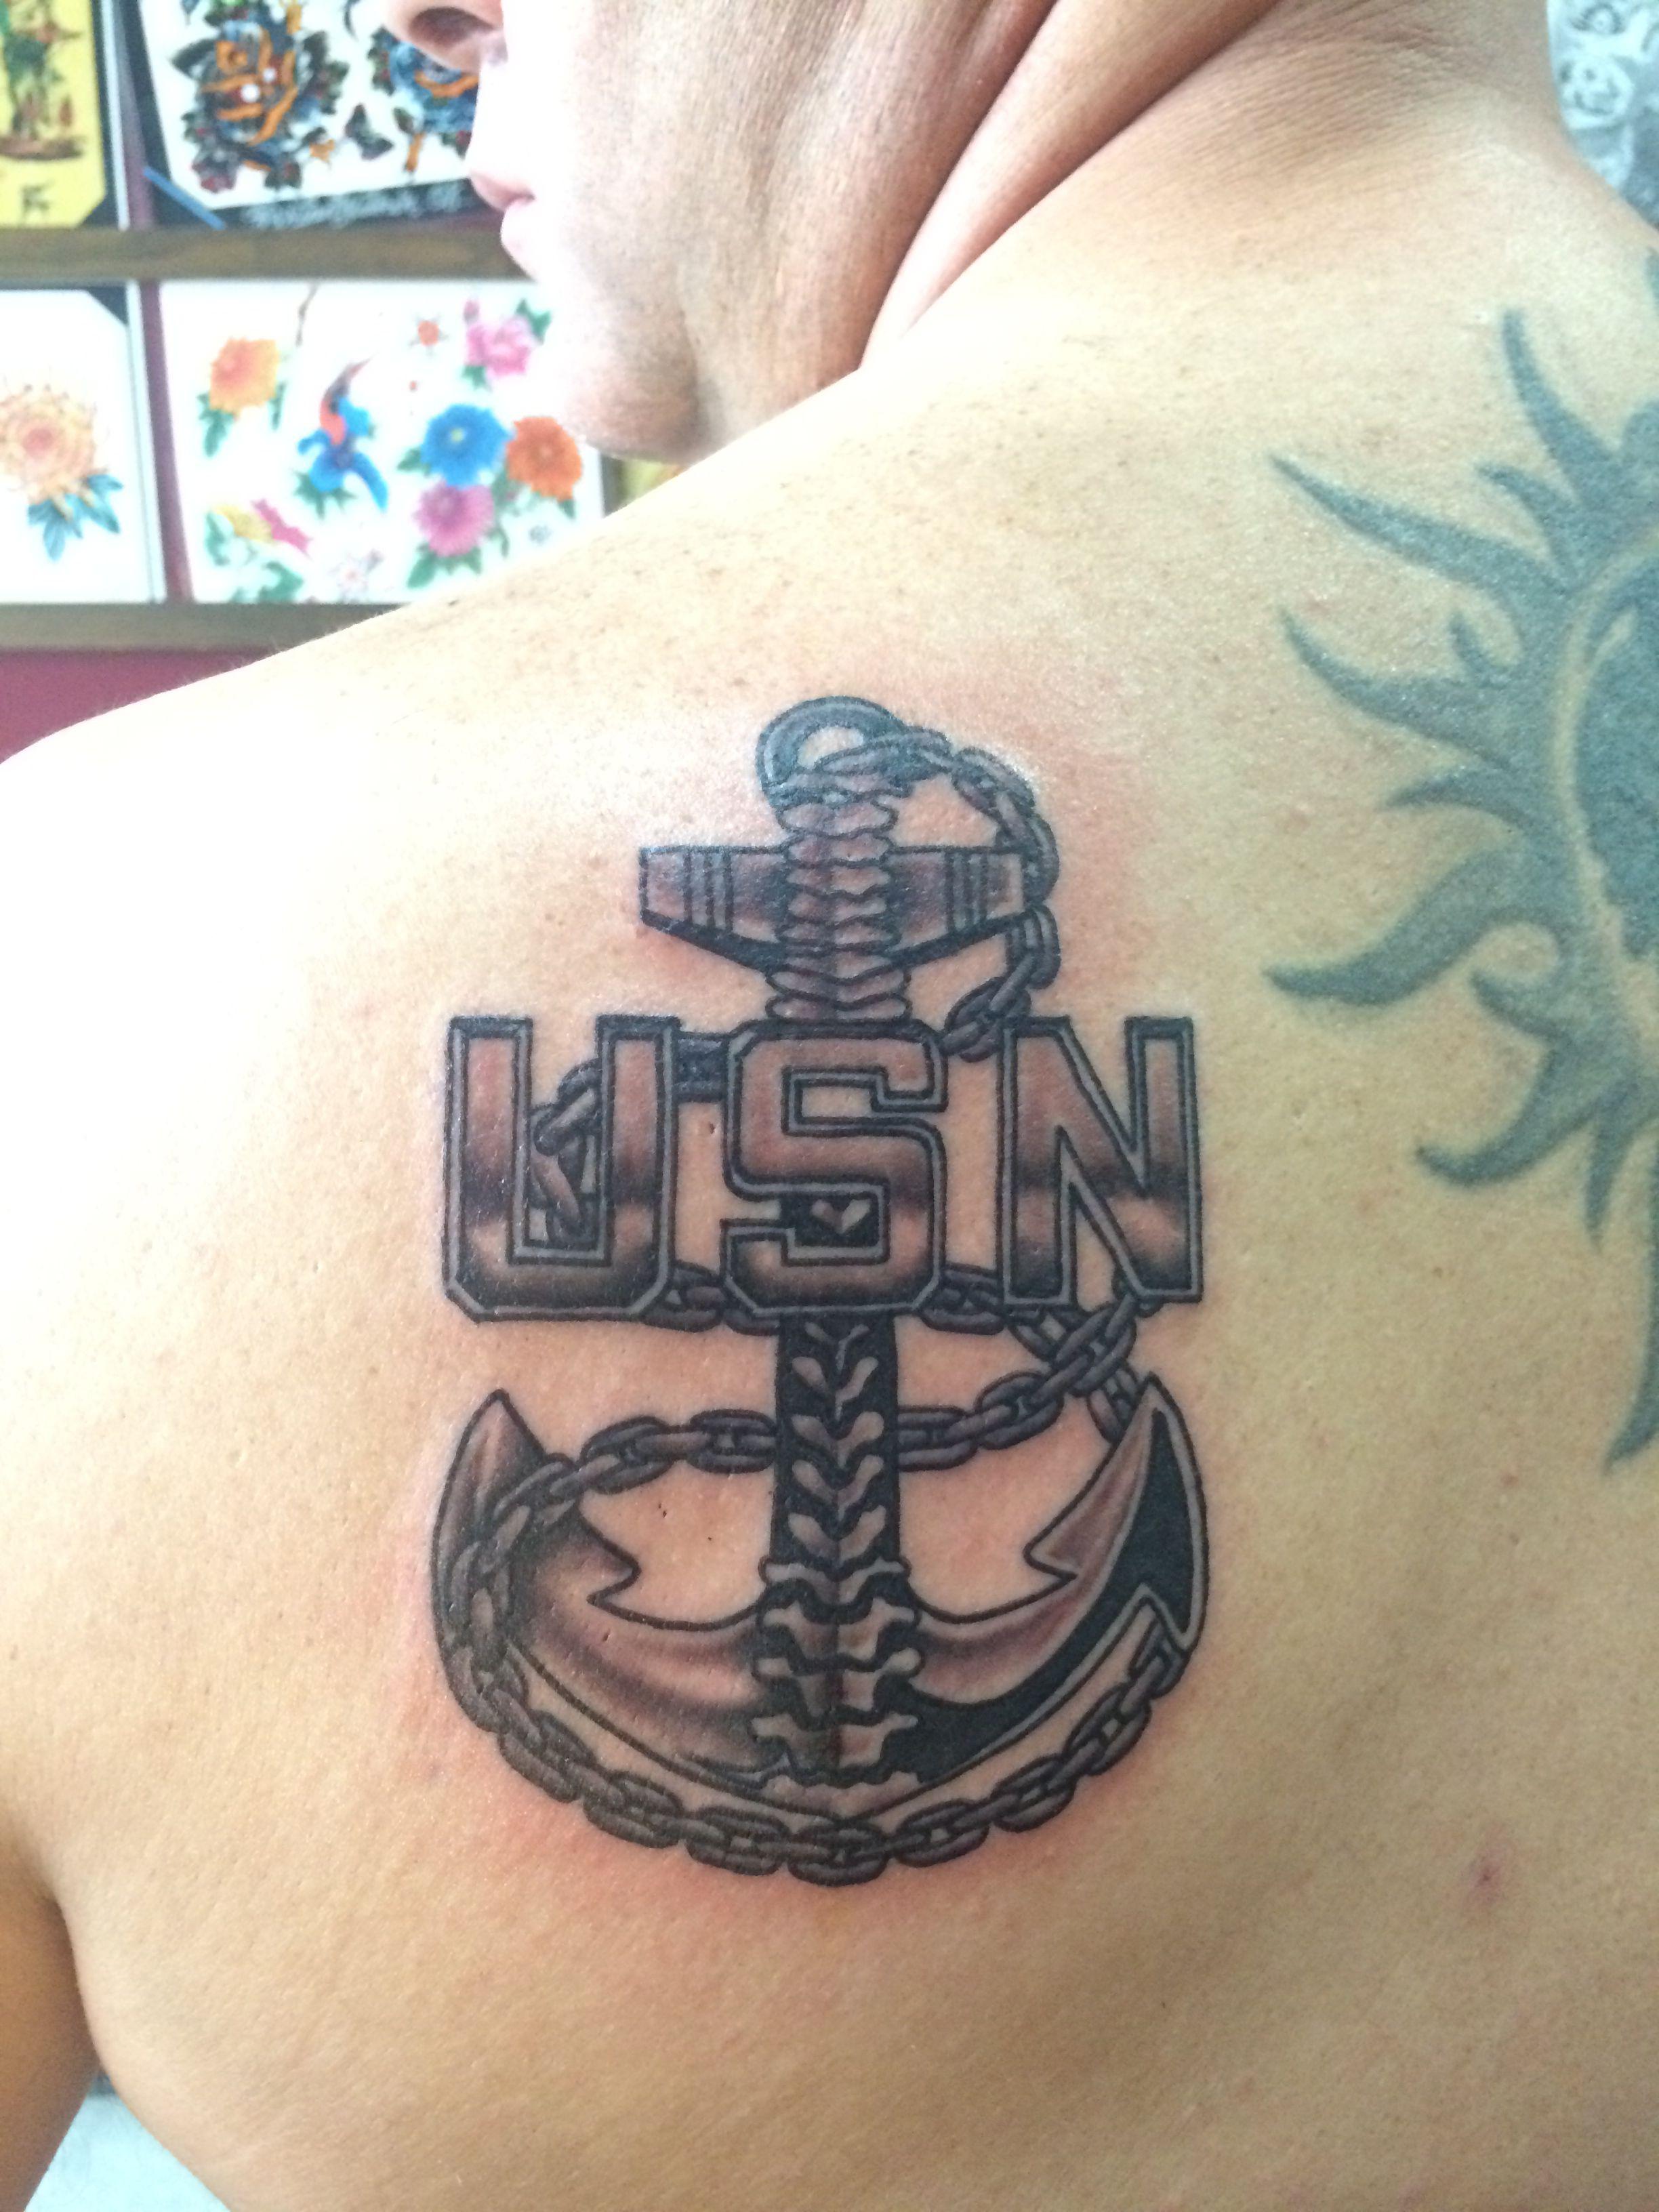 United states navy tattoos